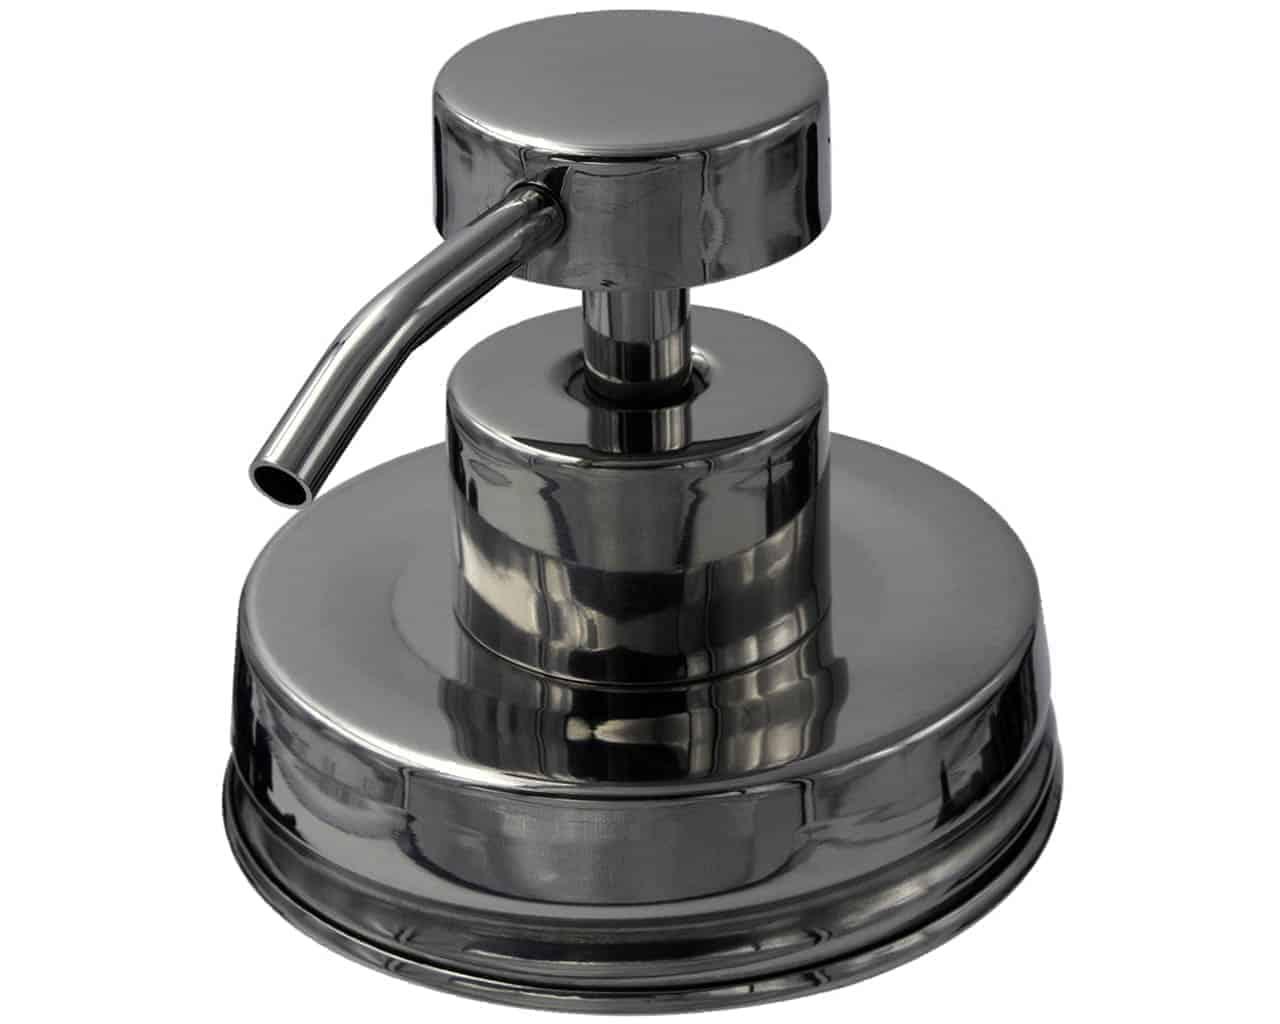 mason-jar-lifestyle-rust-proof-soap-lotion-pump-dispenser-lid-kit-mirror-chrome-2-regular-mouth-mason-jars